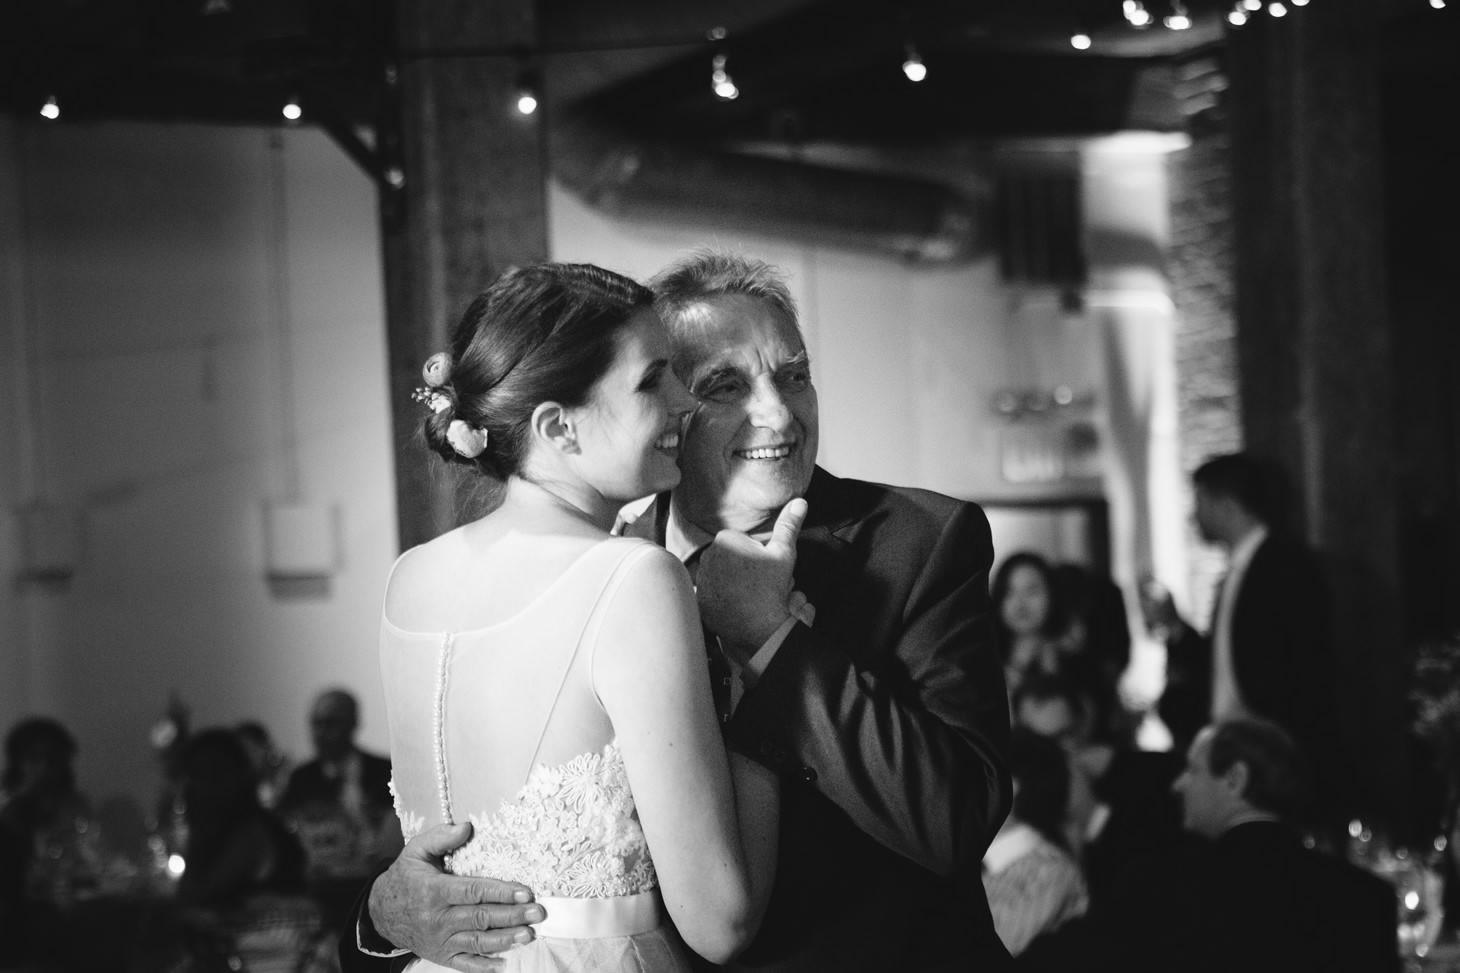 035-nyc-dumbo-loft-brooklyn-wedding-photographer-smitten-chickens-photo-.jpg